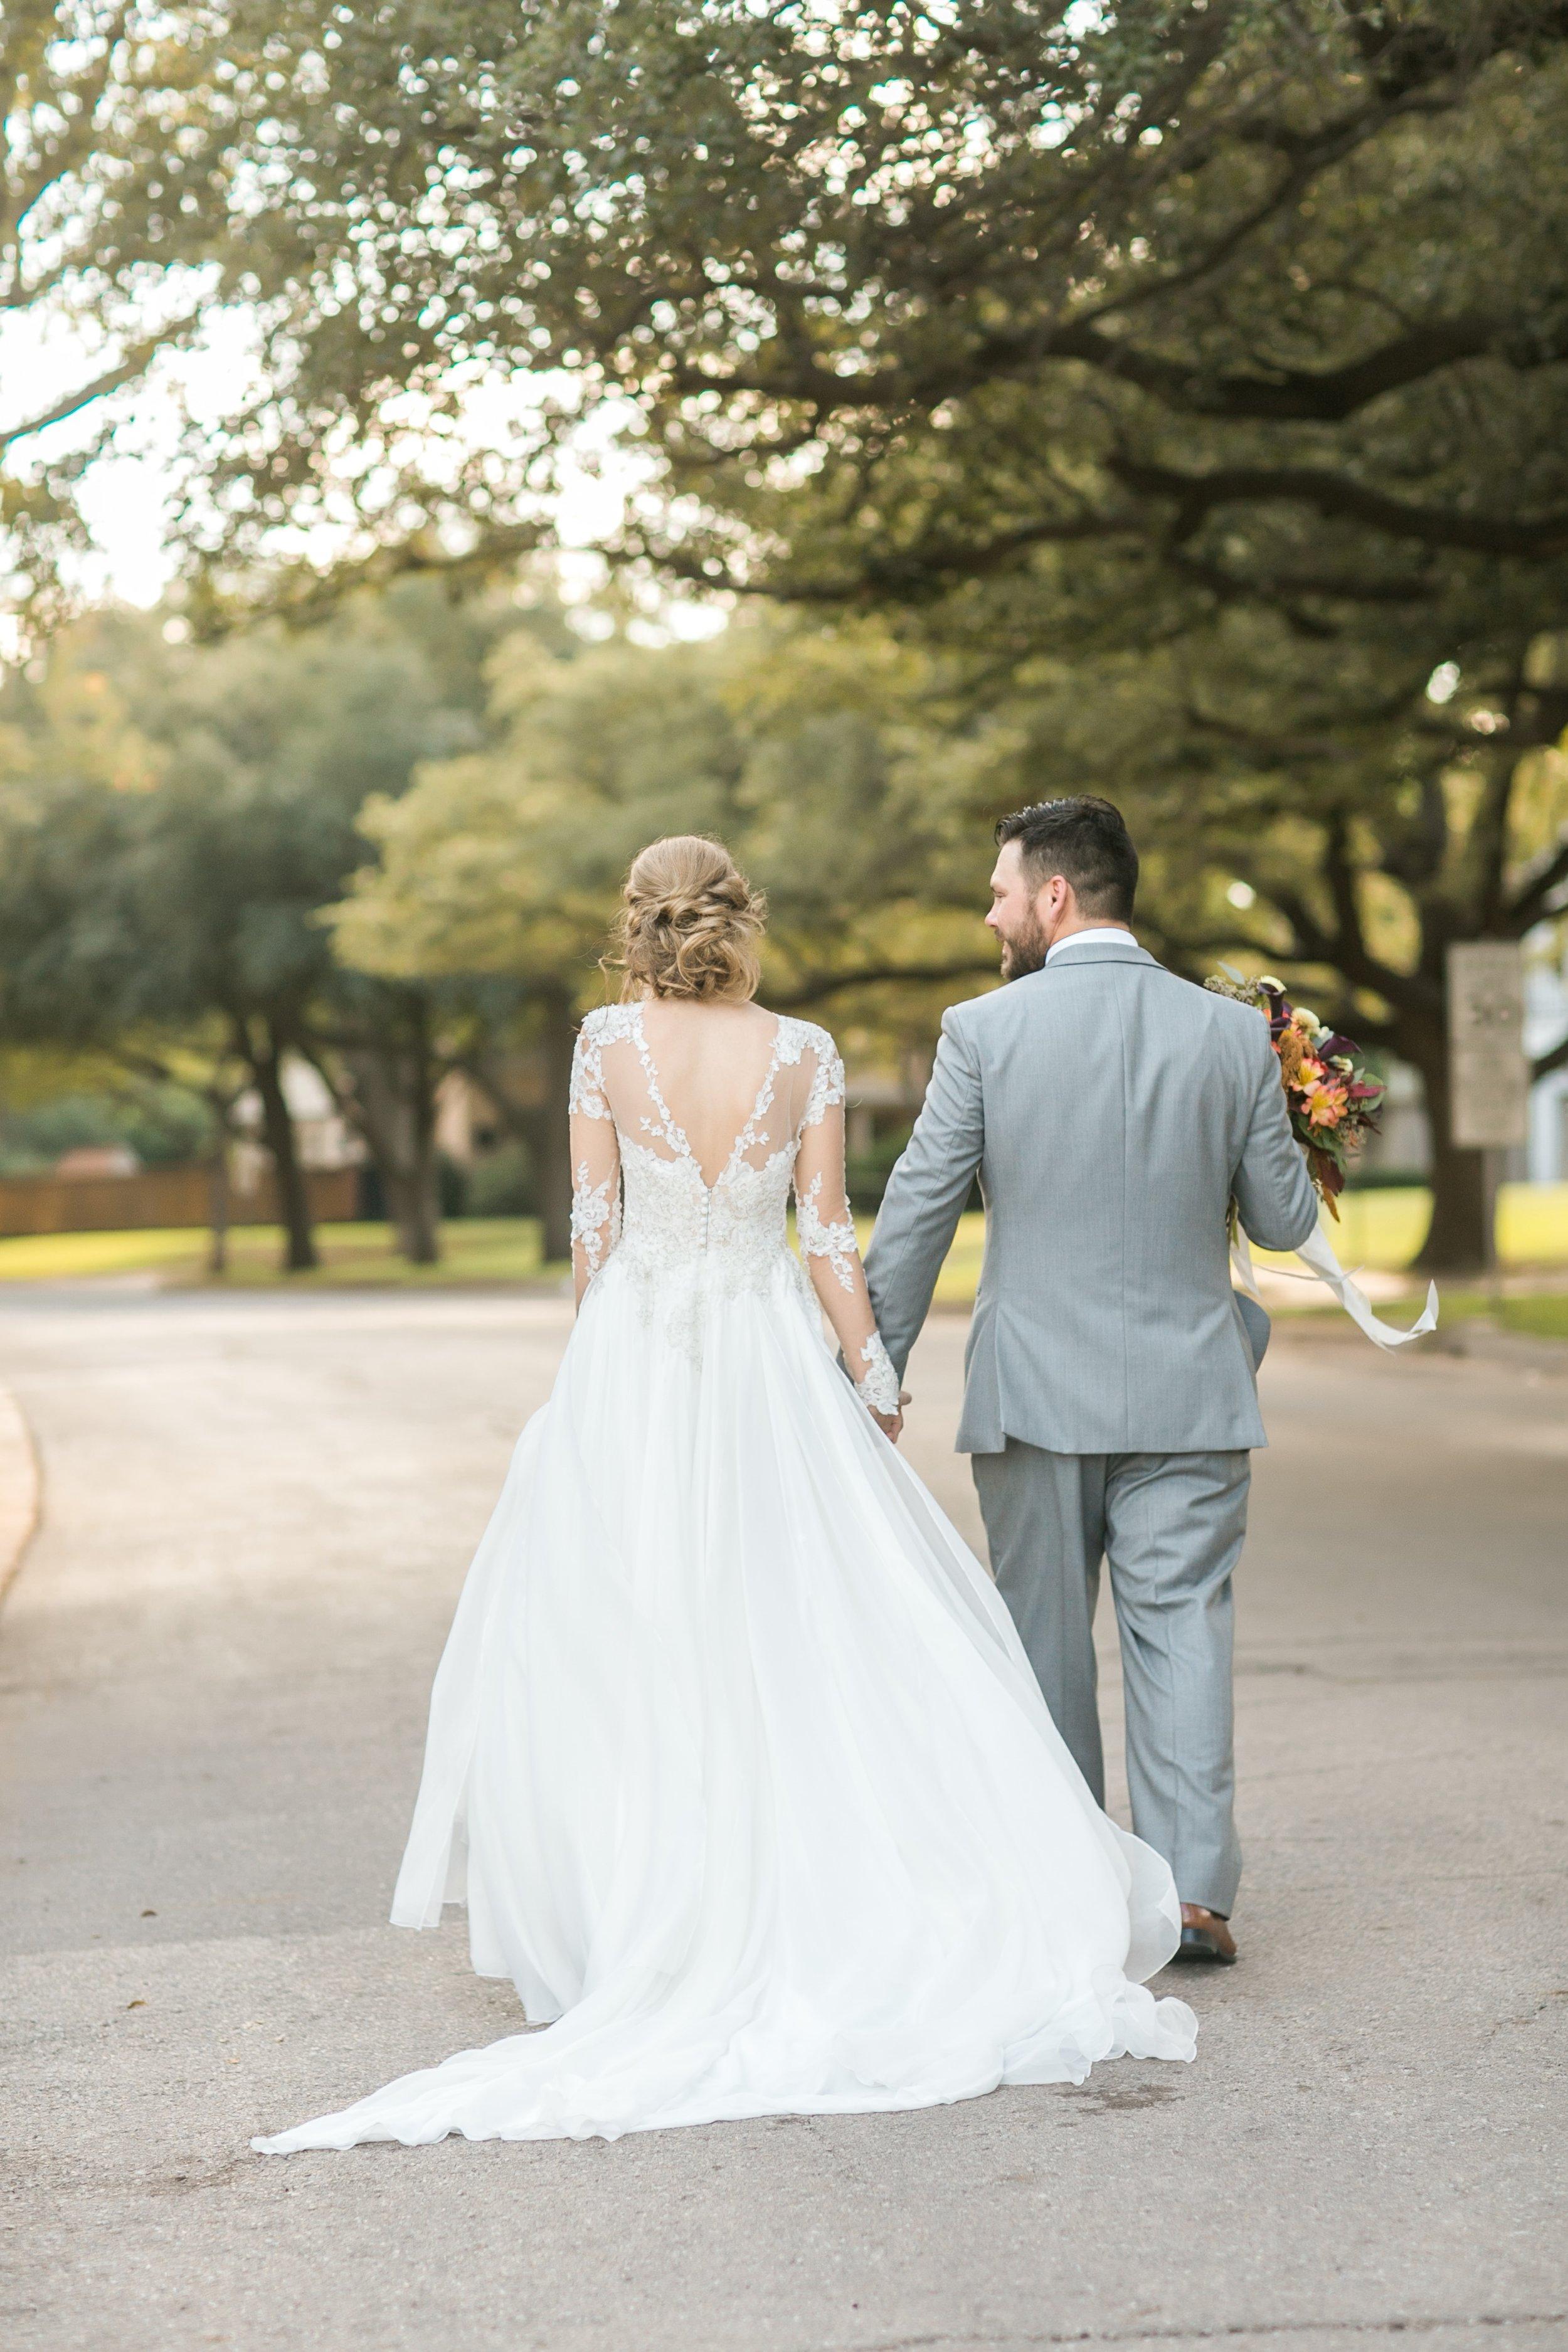 Roberson-Wedding-The-Forum-Lauren-Pinson-Wedding-Photography-Wichita-Falls-Texas-045.jpg